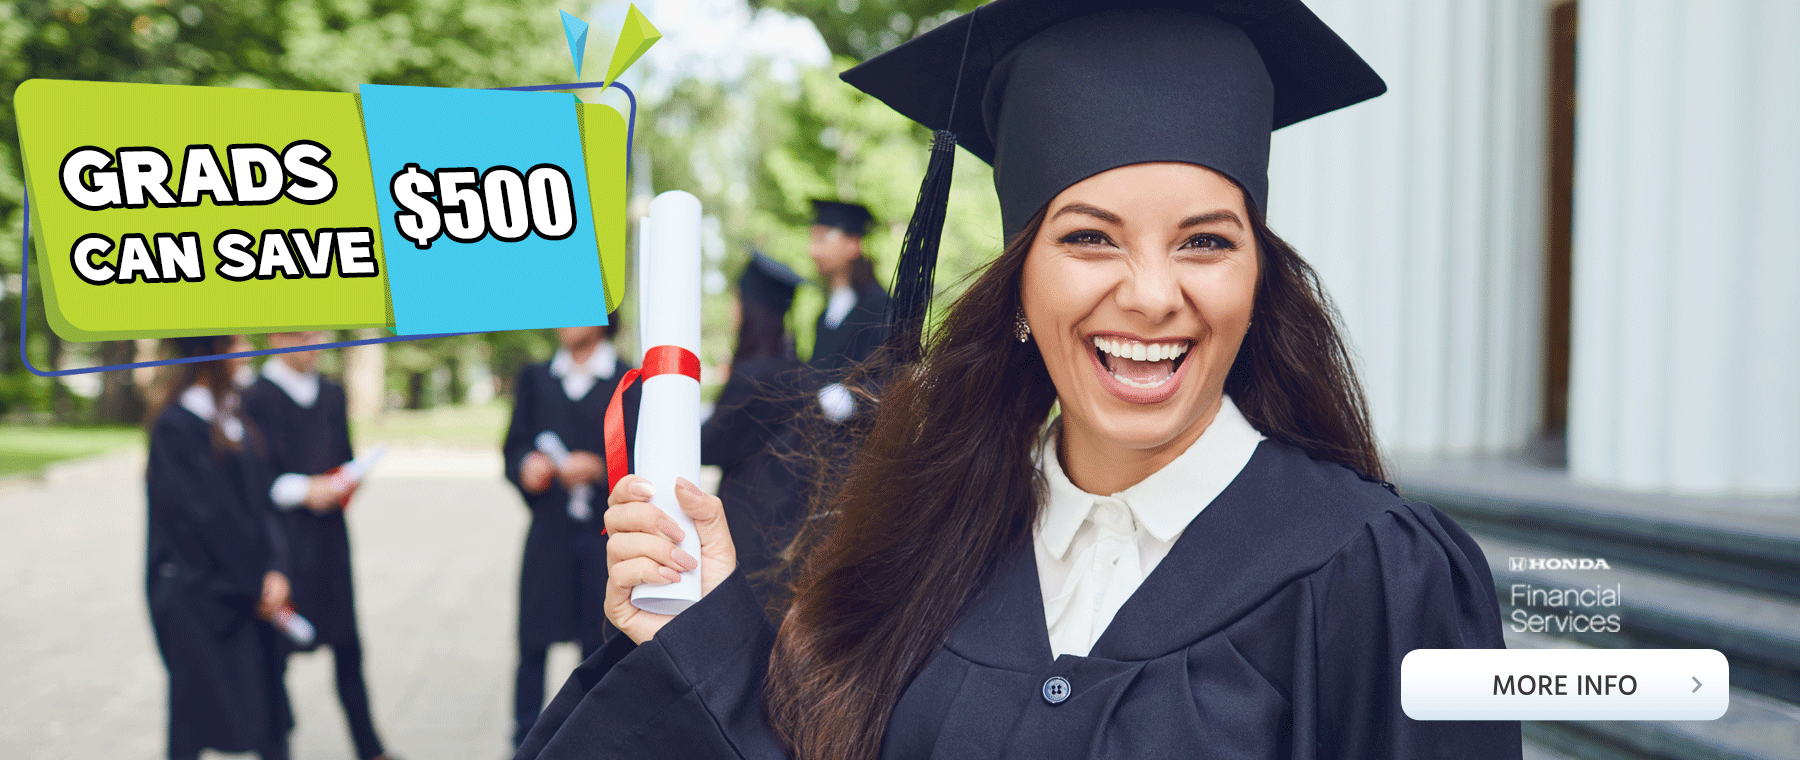 Grad program Save 500 Dollars